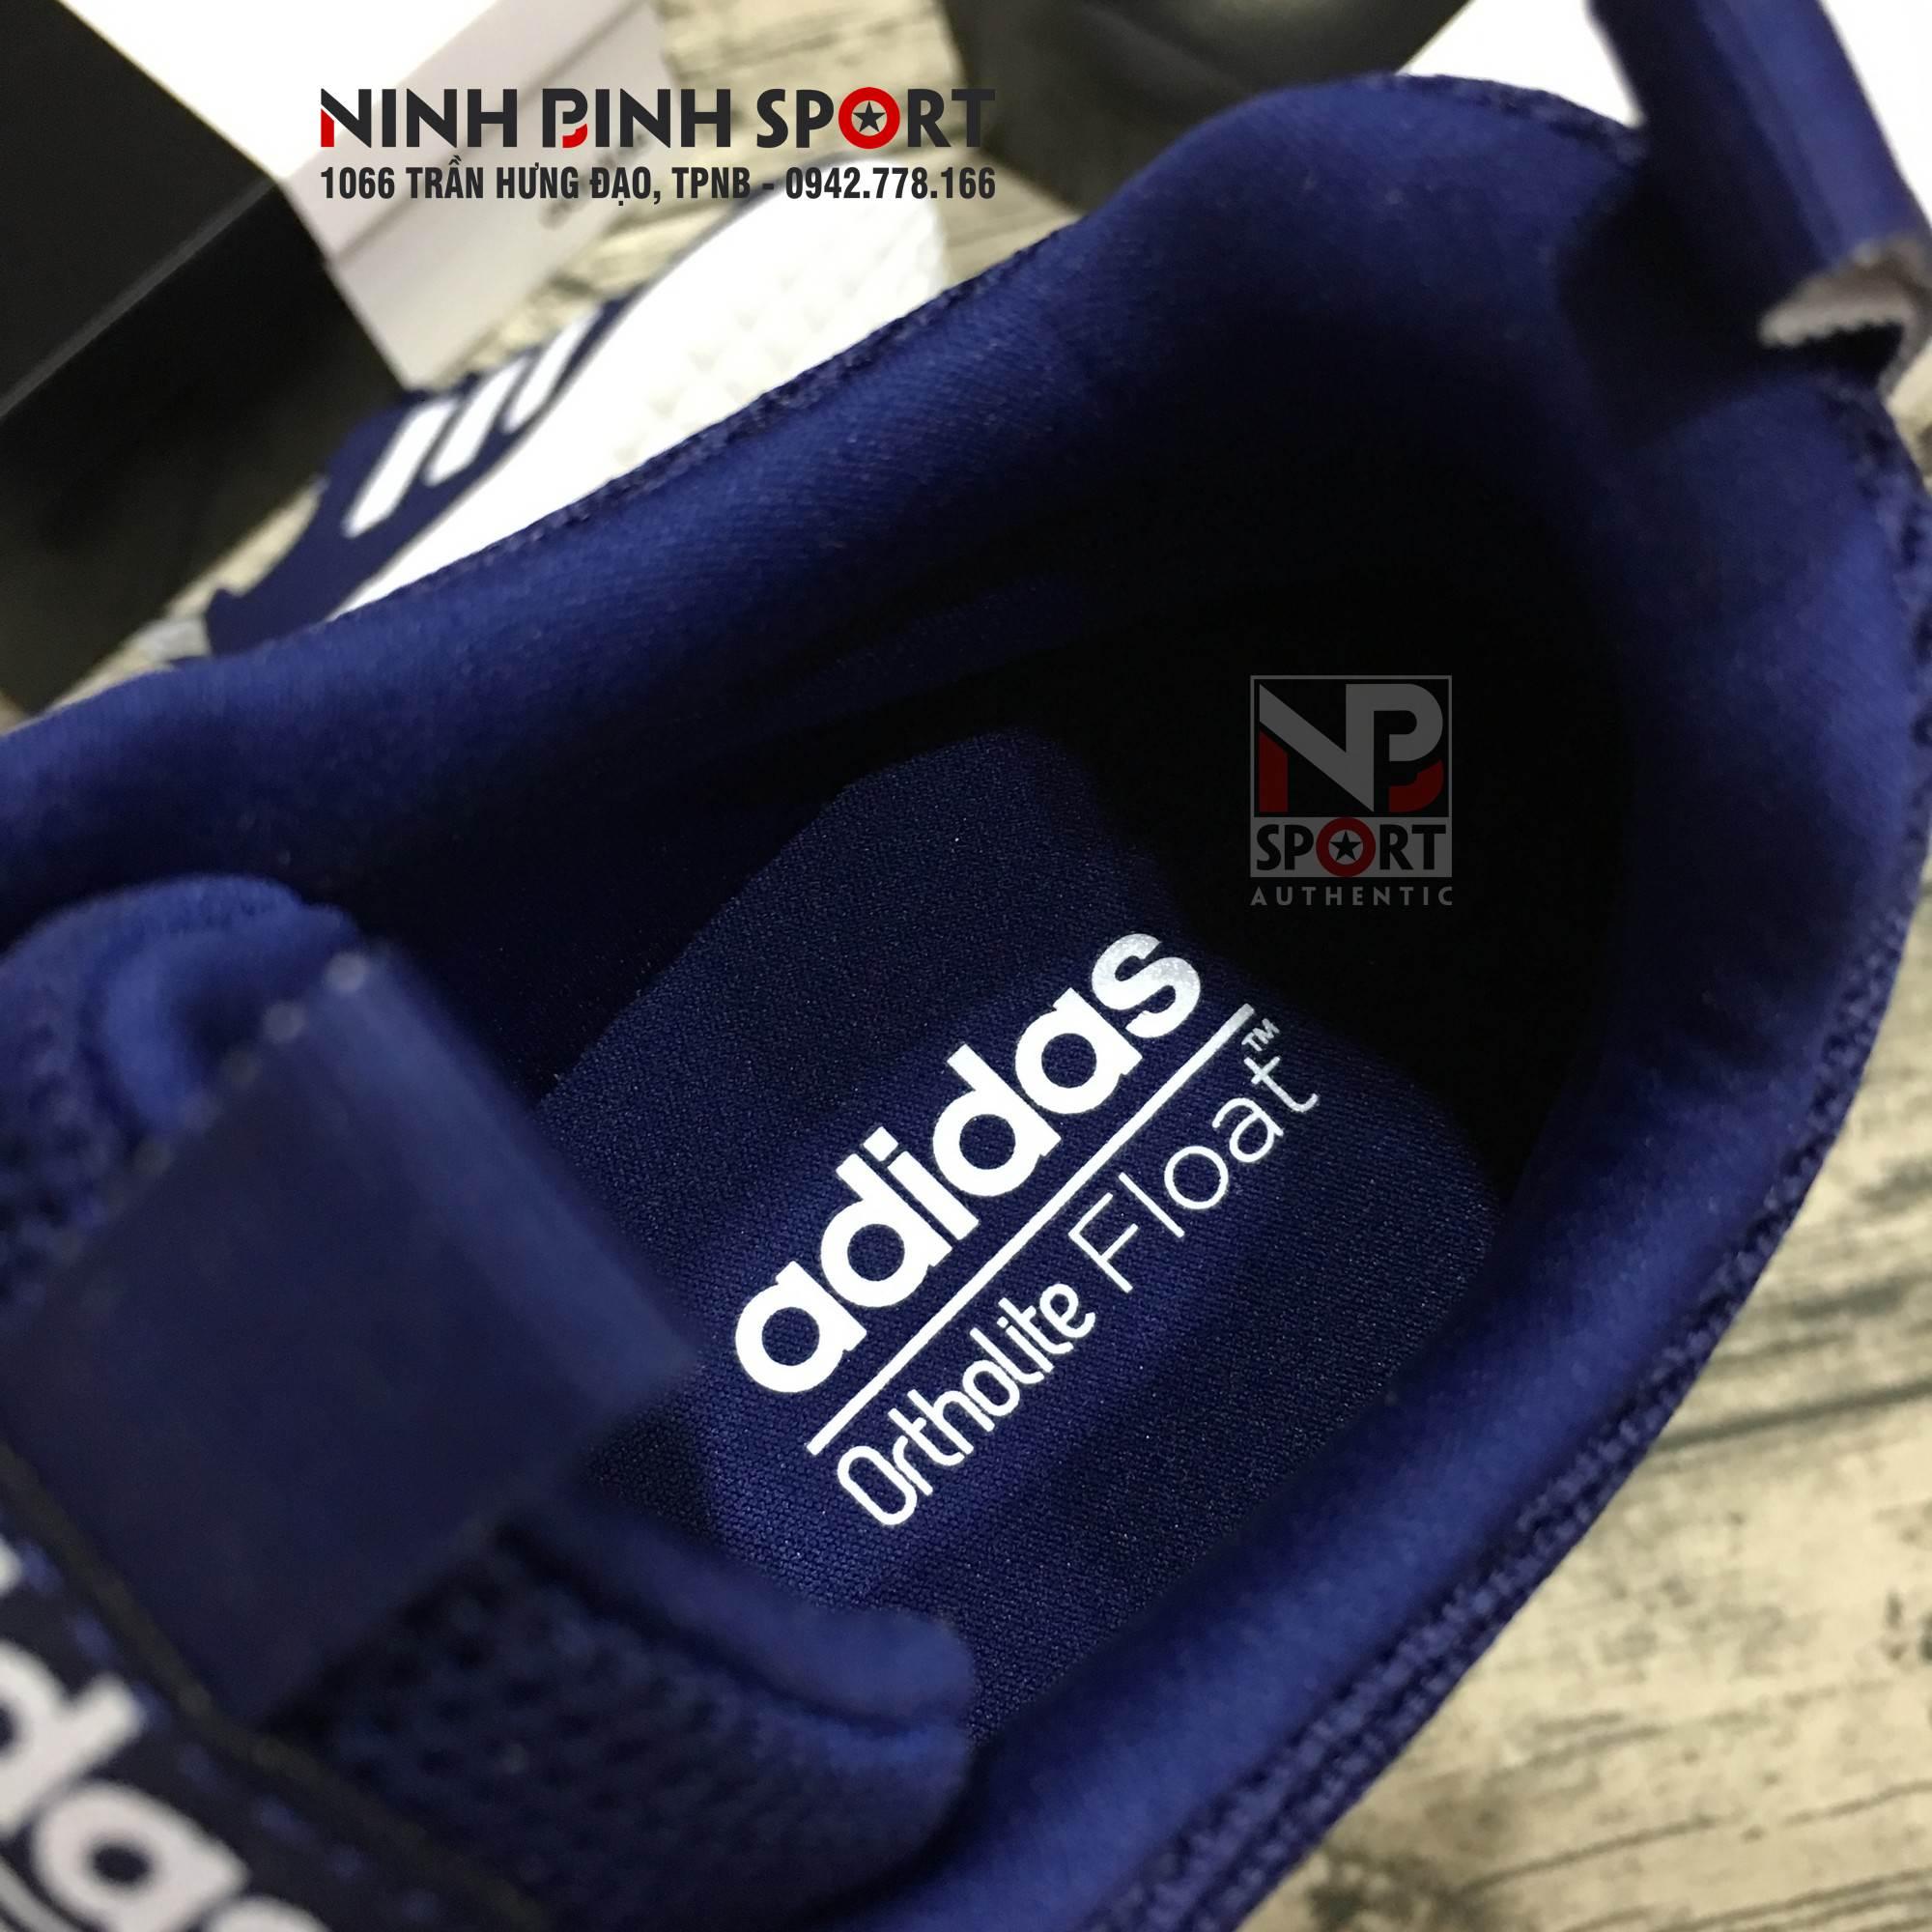 Giày thể thao nam Adidas NeoLite Racer CLN B96566